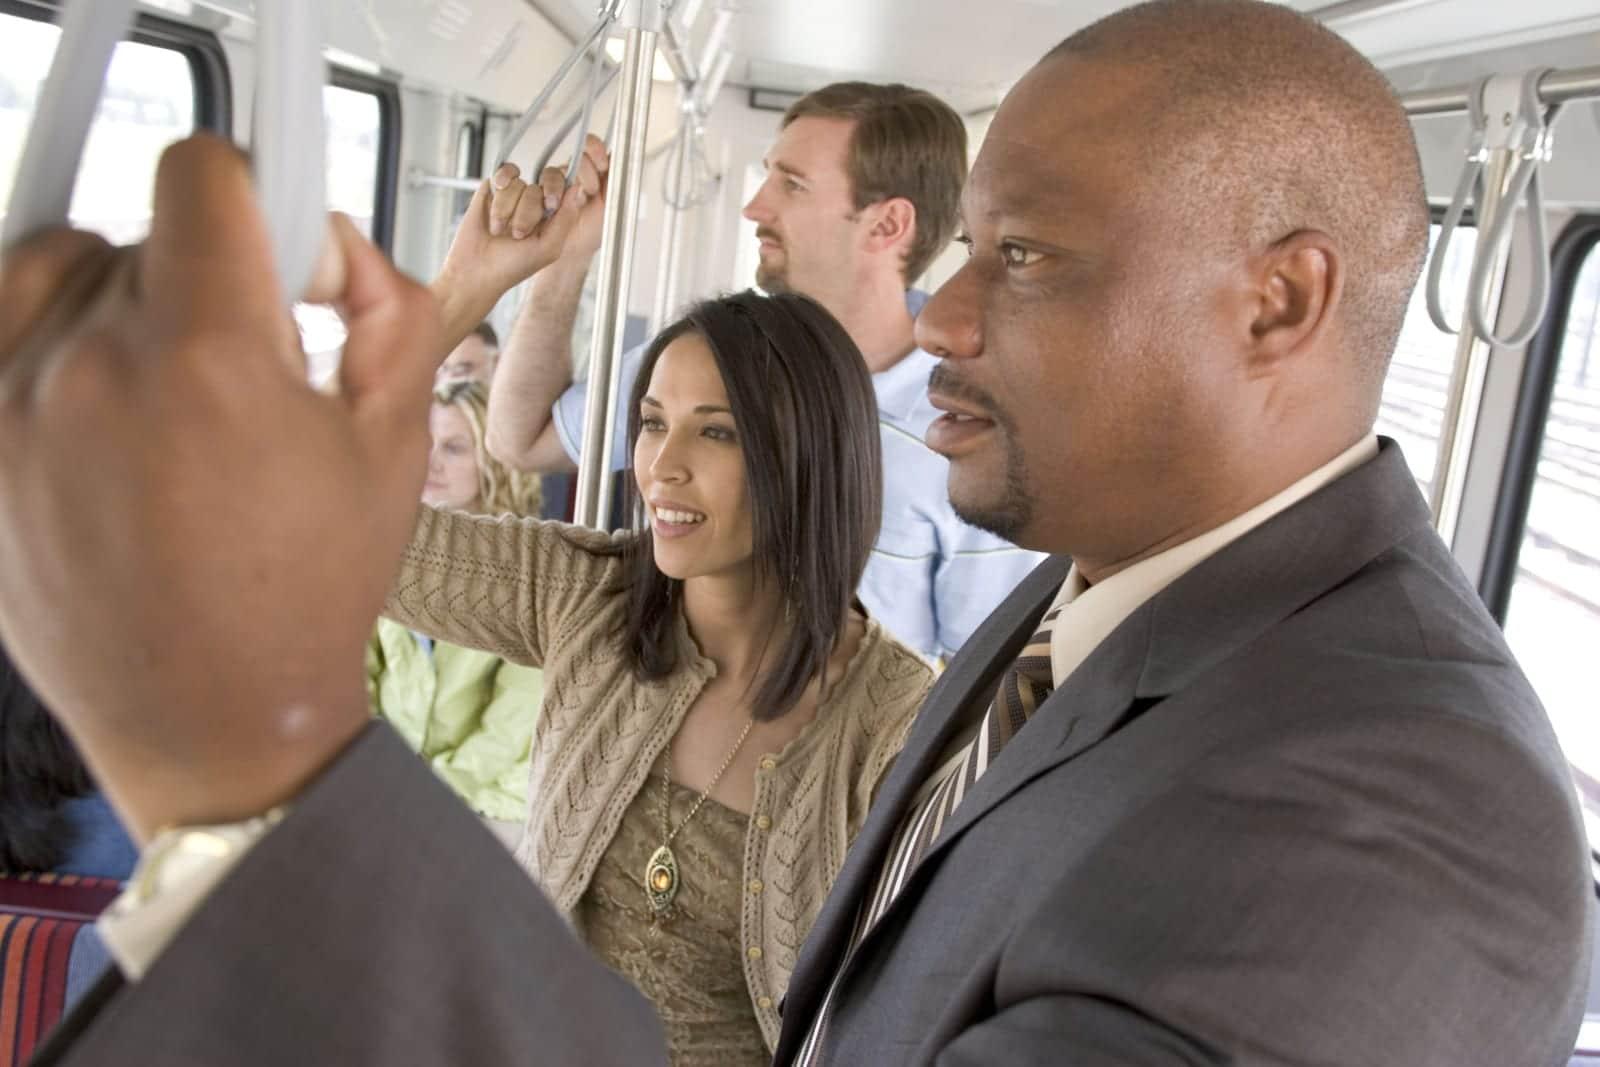 RTD Train Light Rail Passengers On-Board